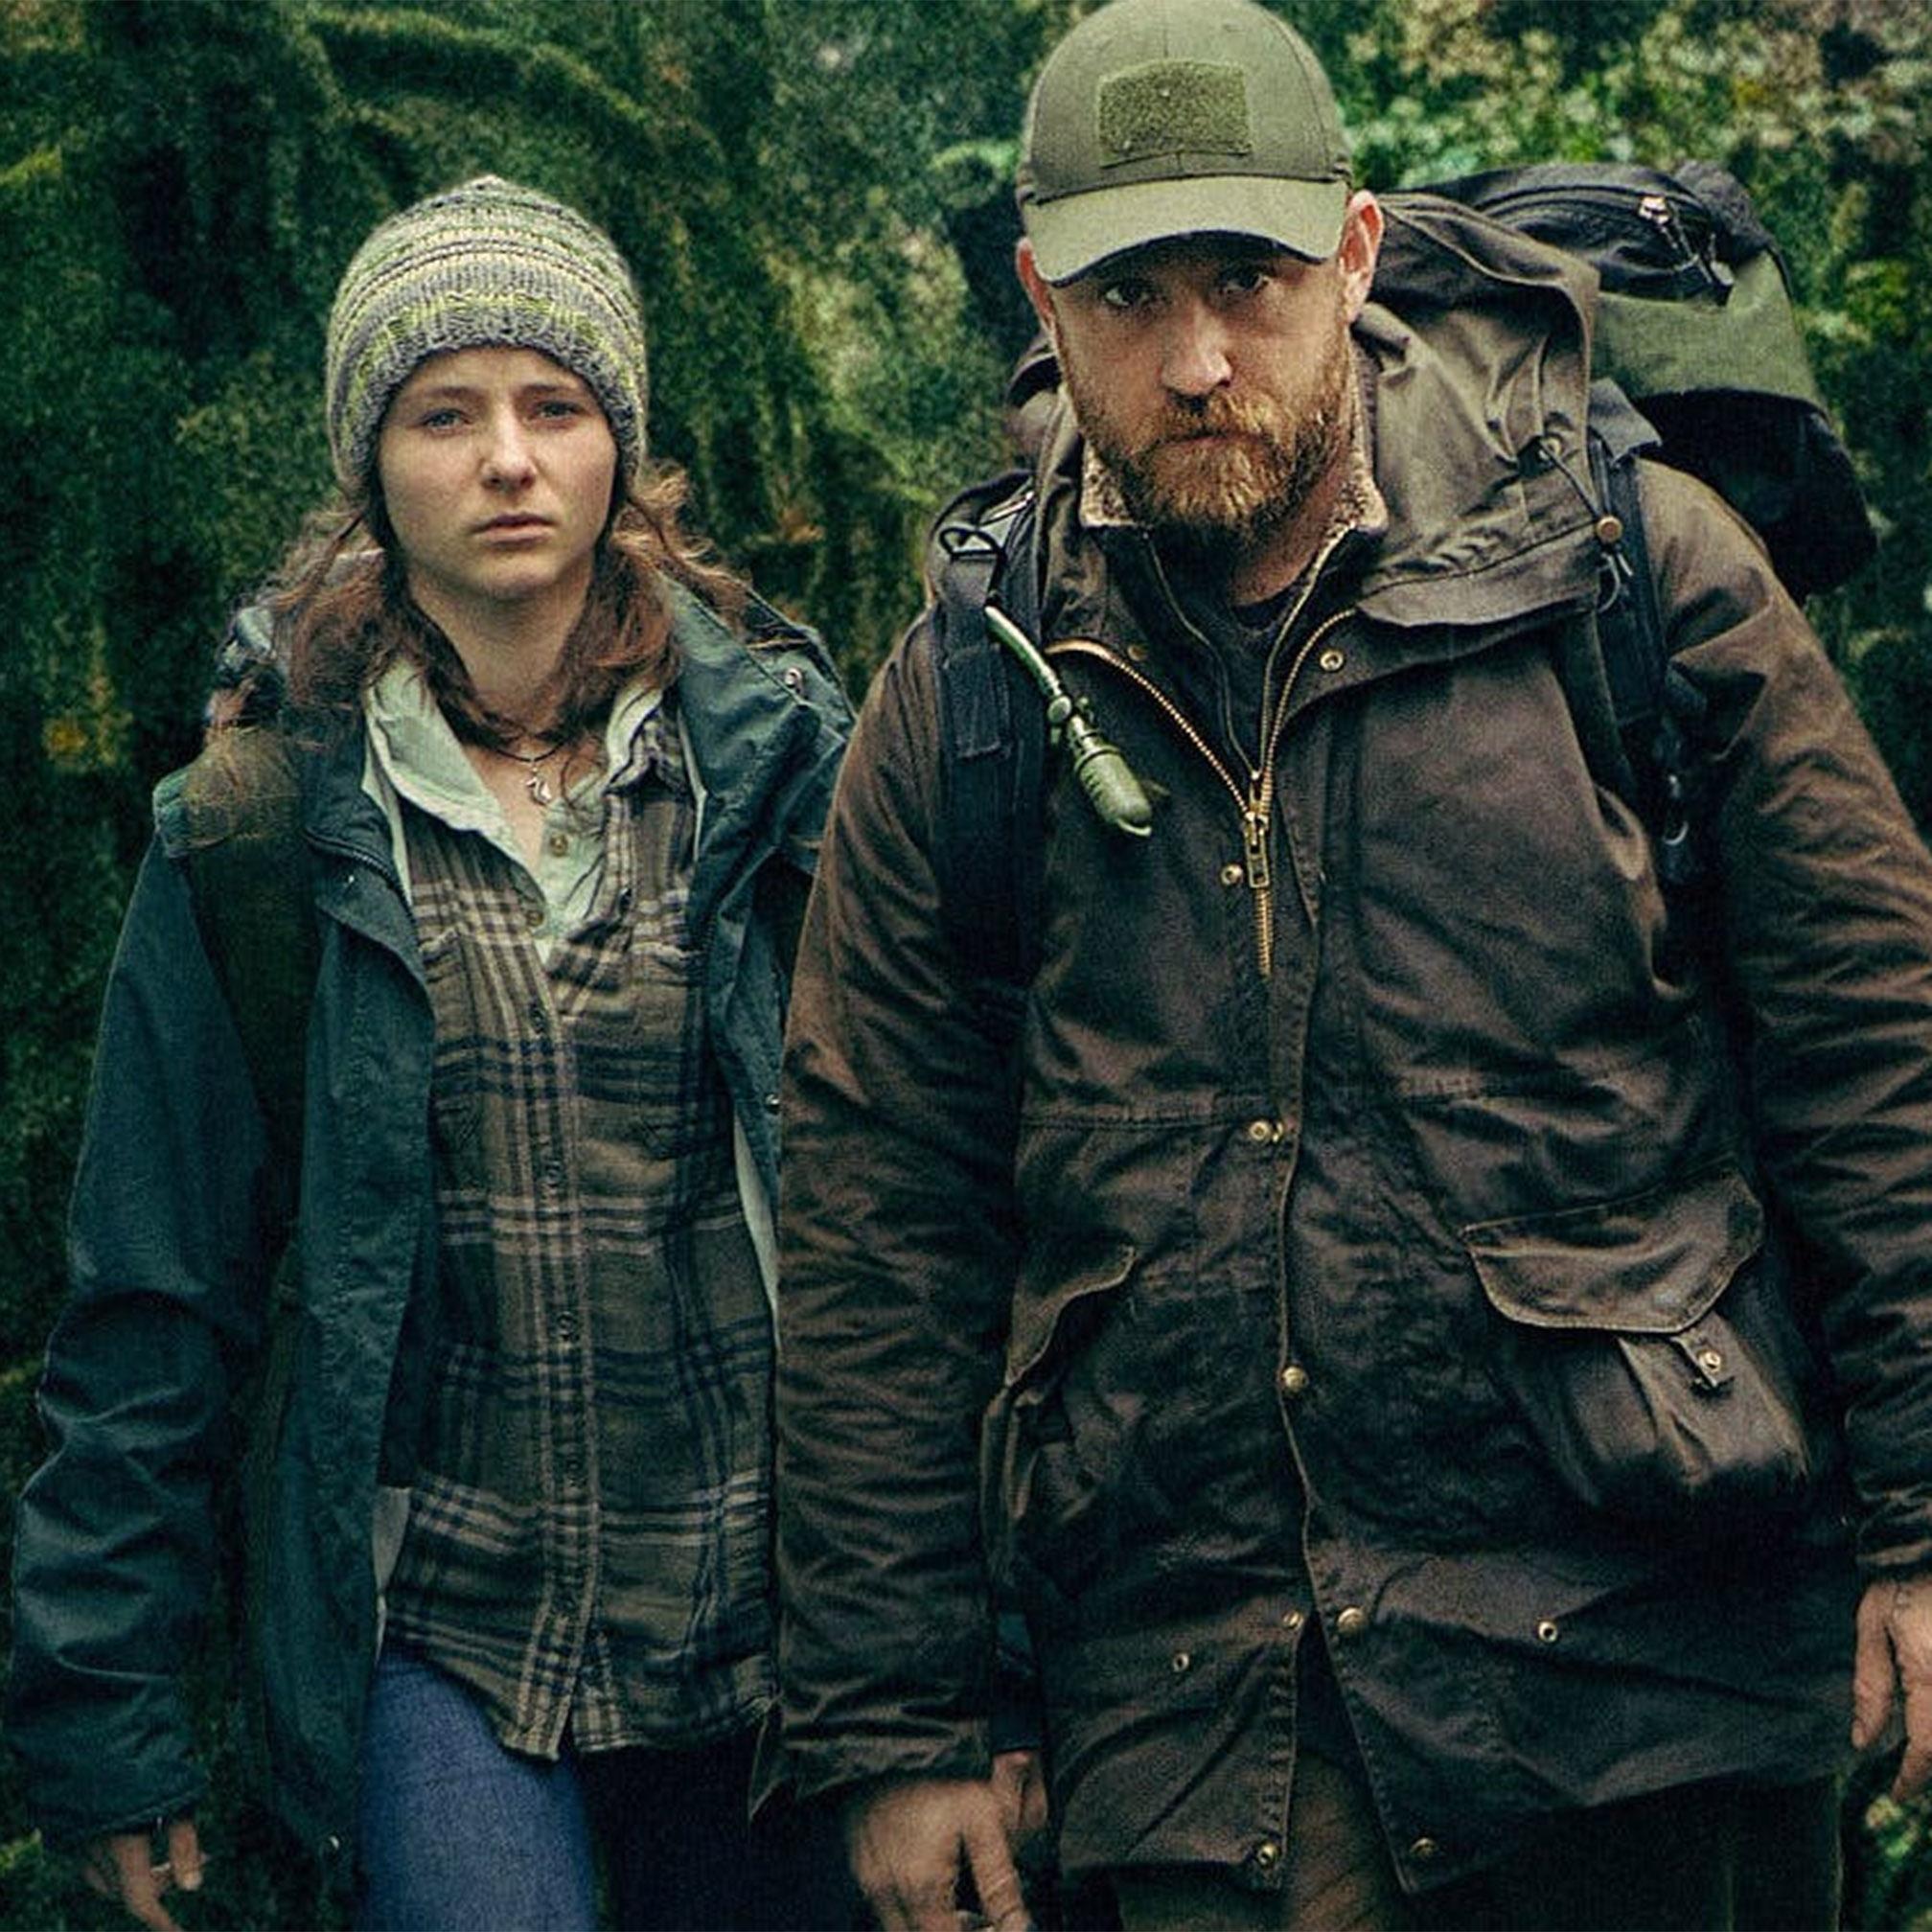 Leave no Trace – Bergstaden Filmklubb